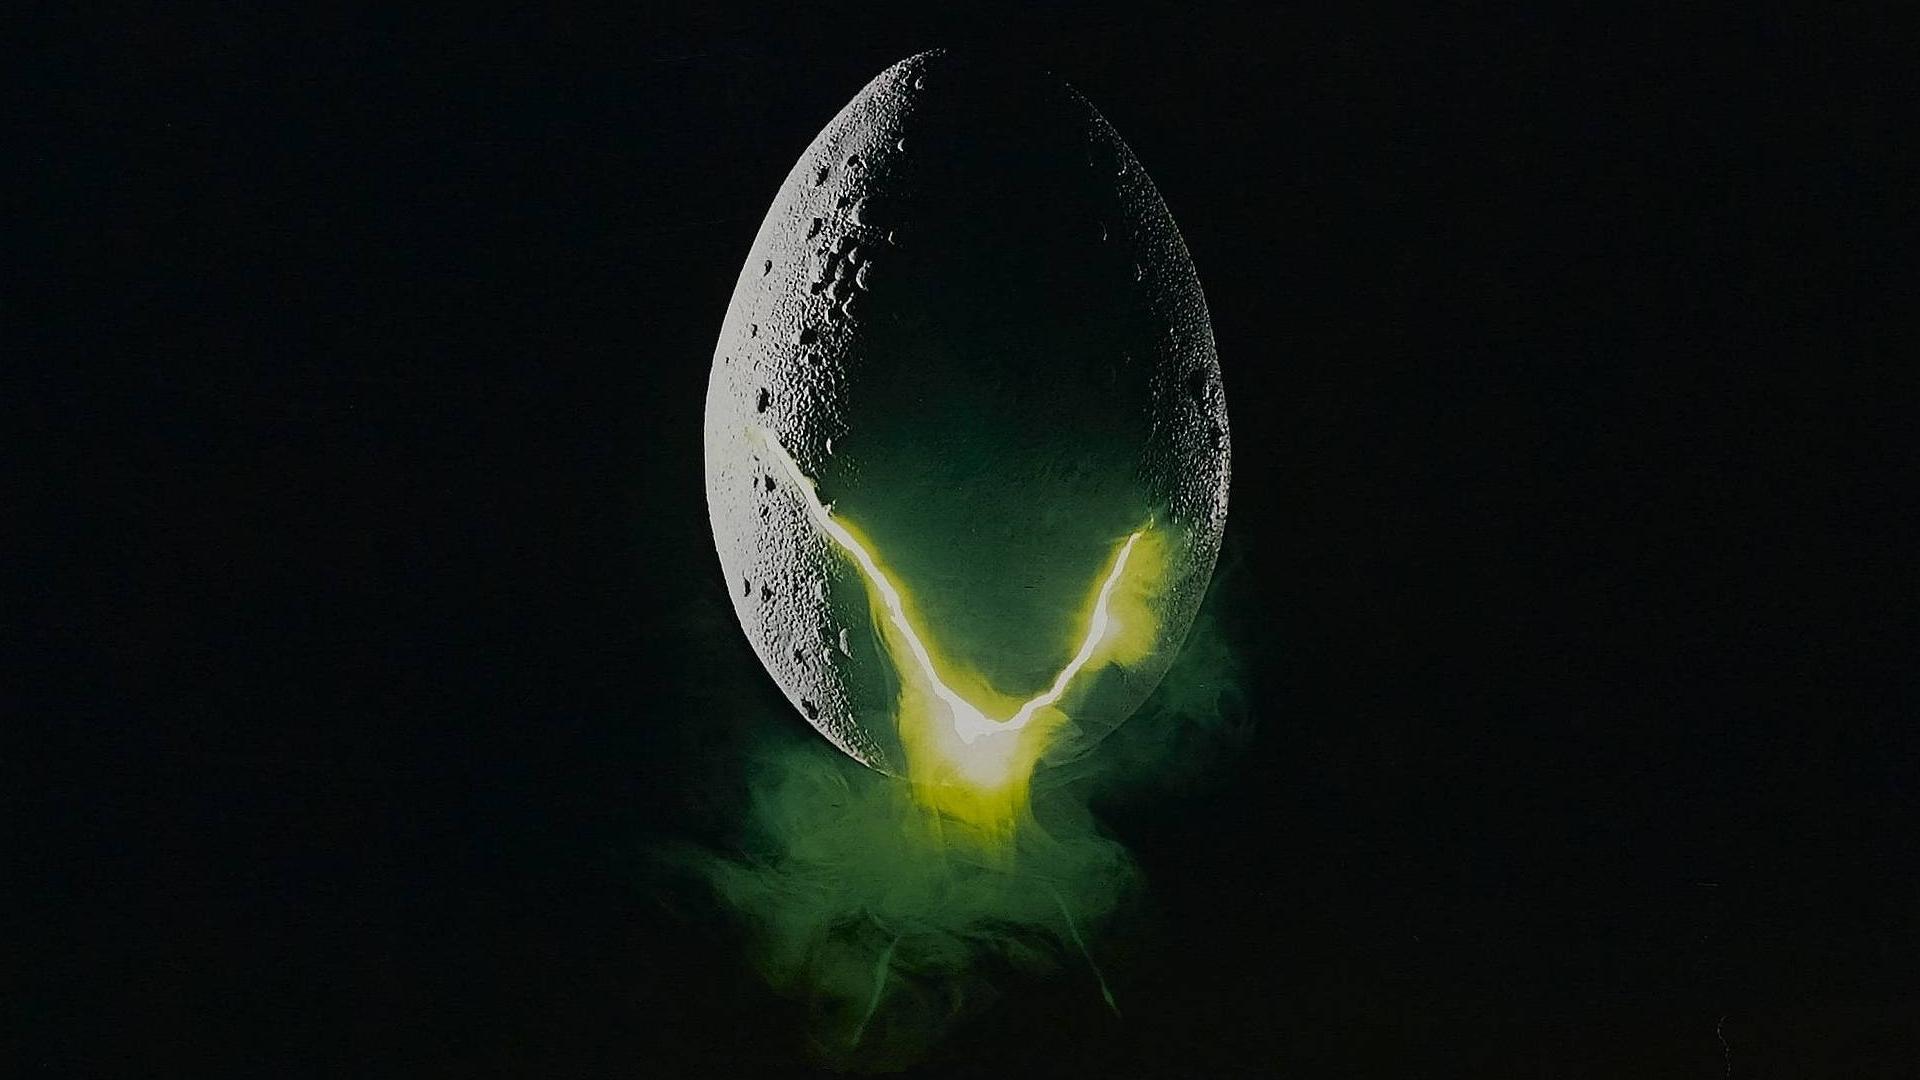 alien hd iphone wallpapers - photo #40